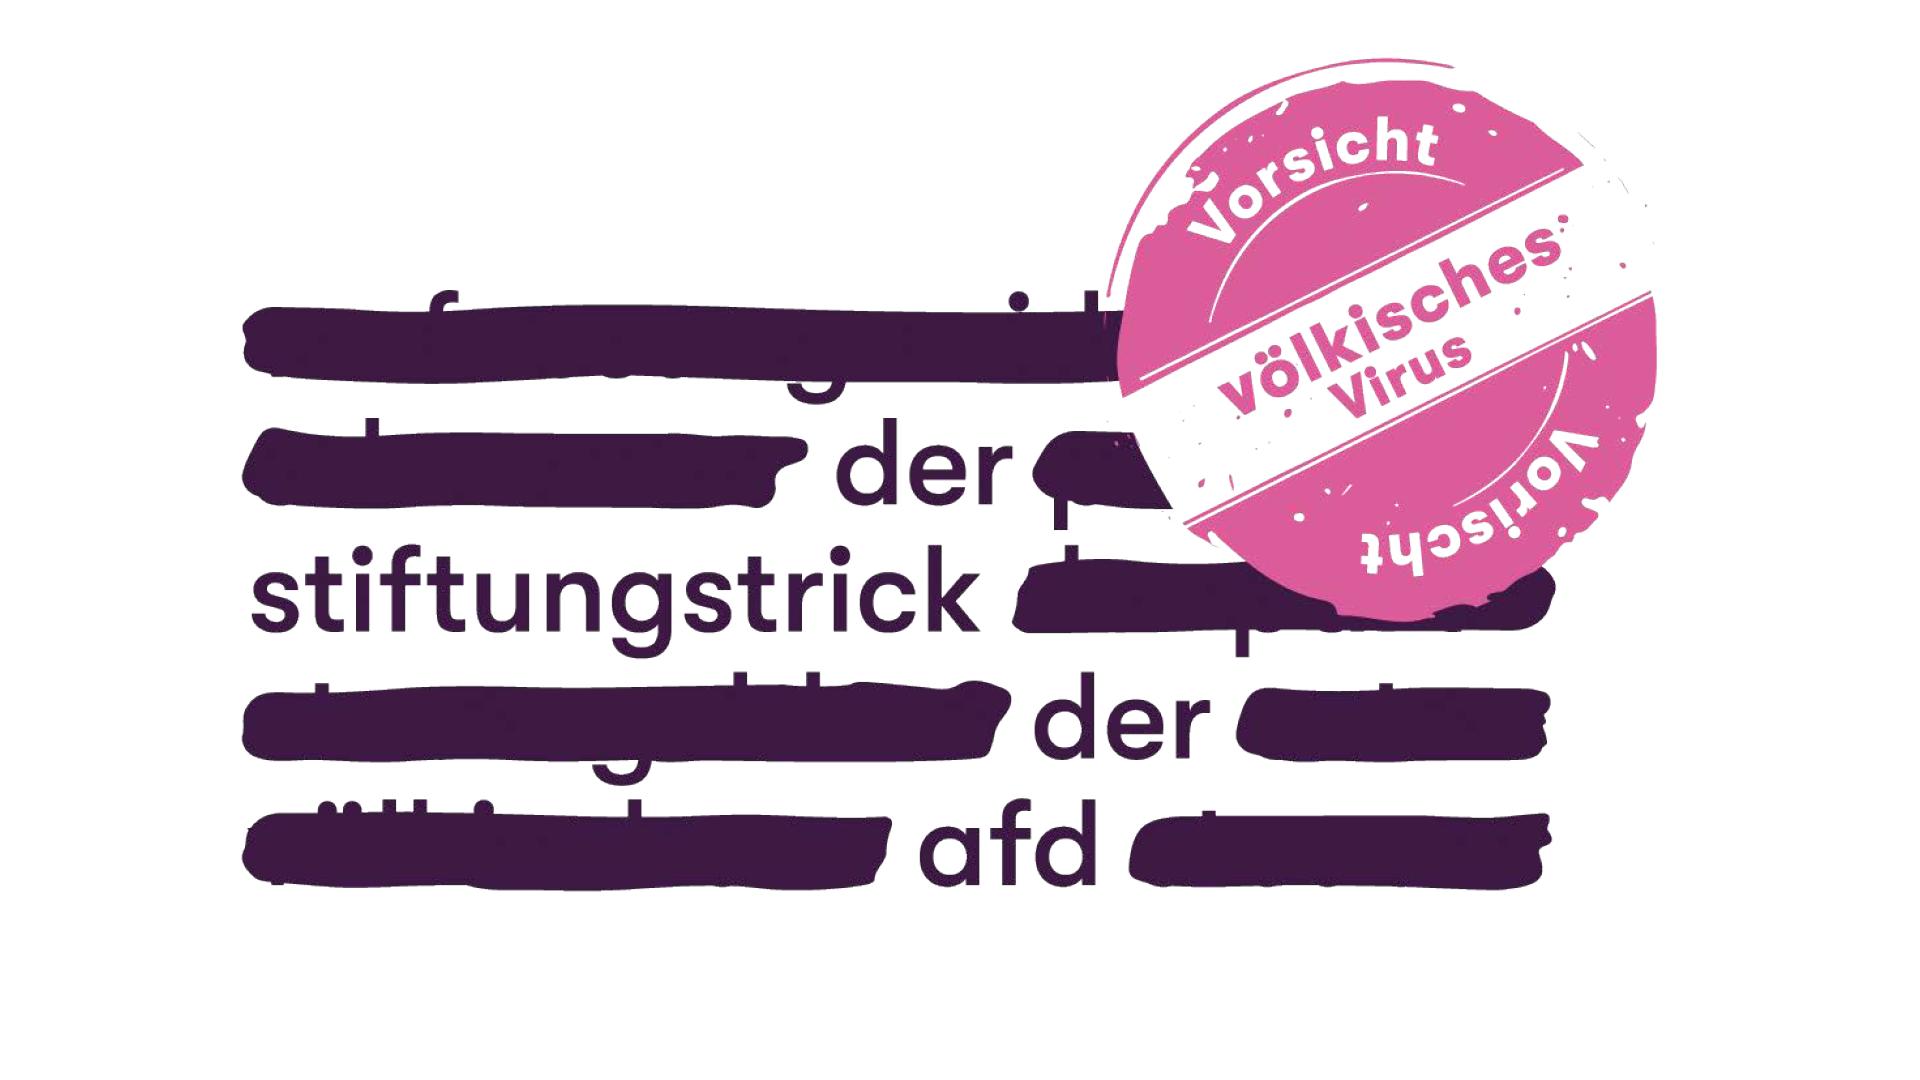 Stiftungstrick